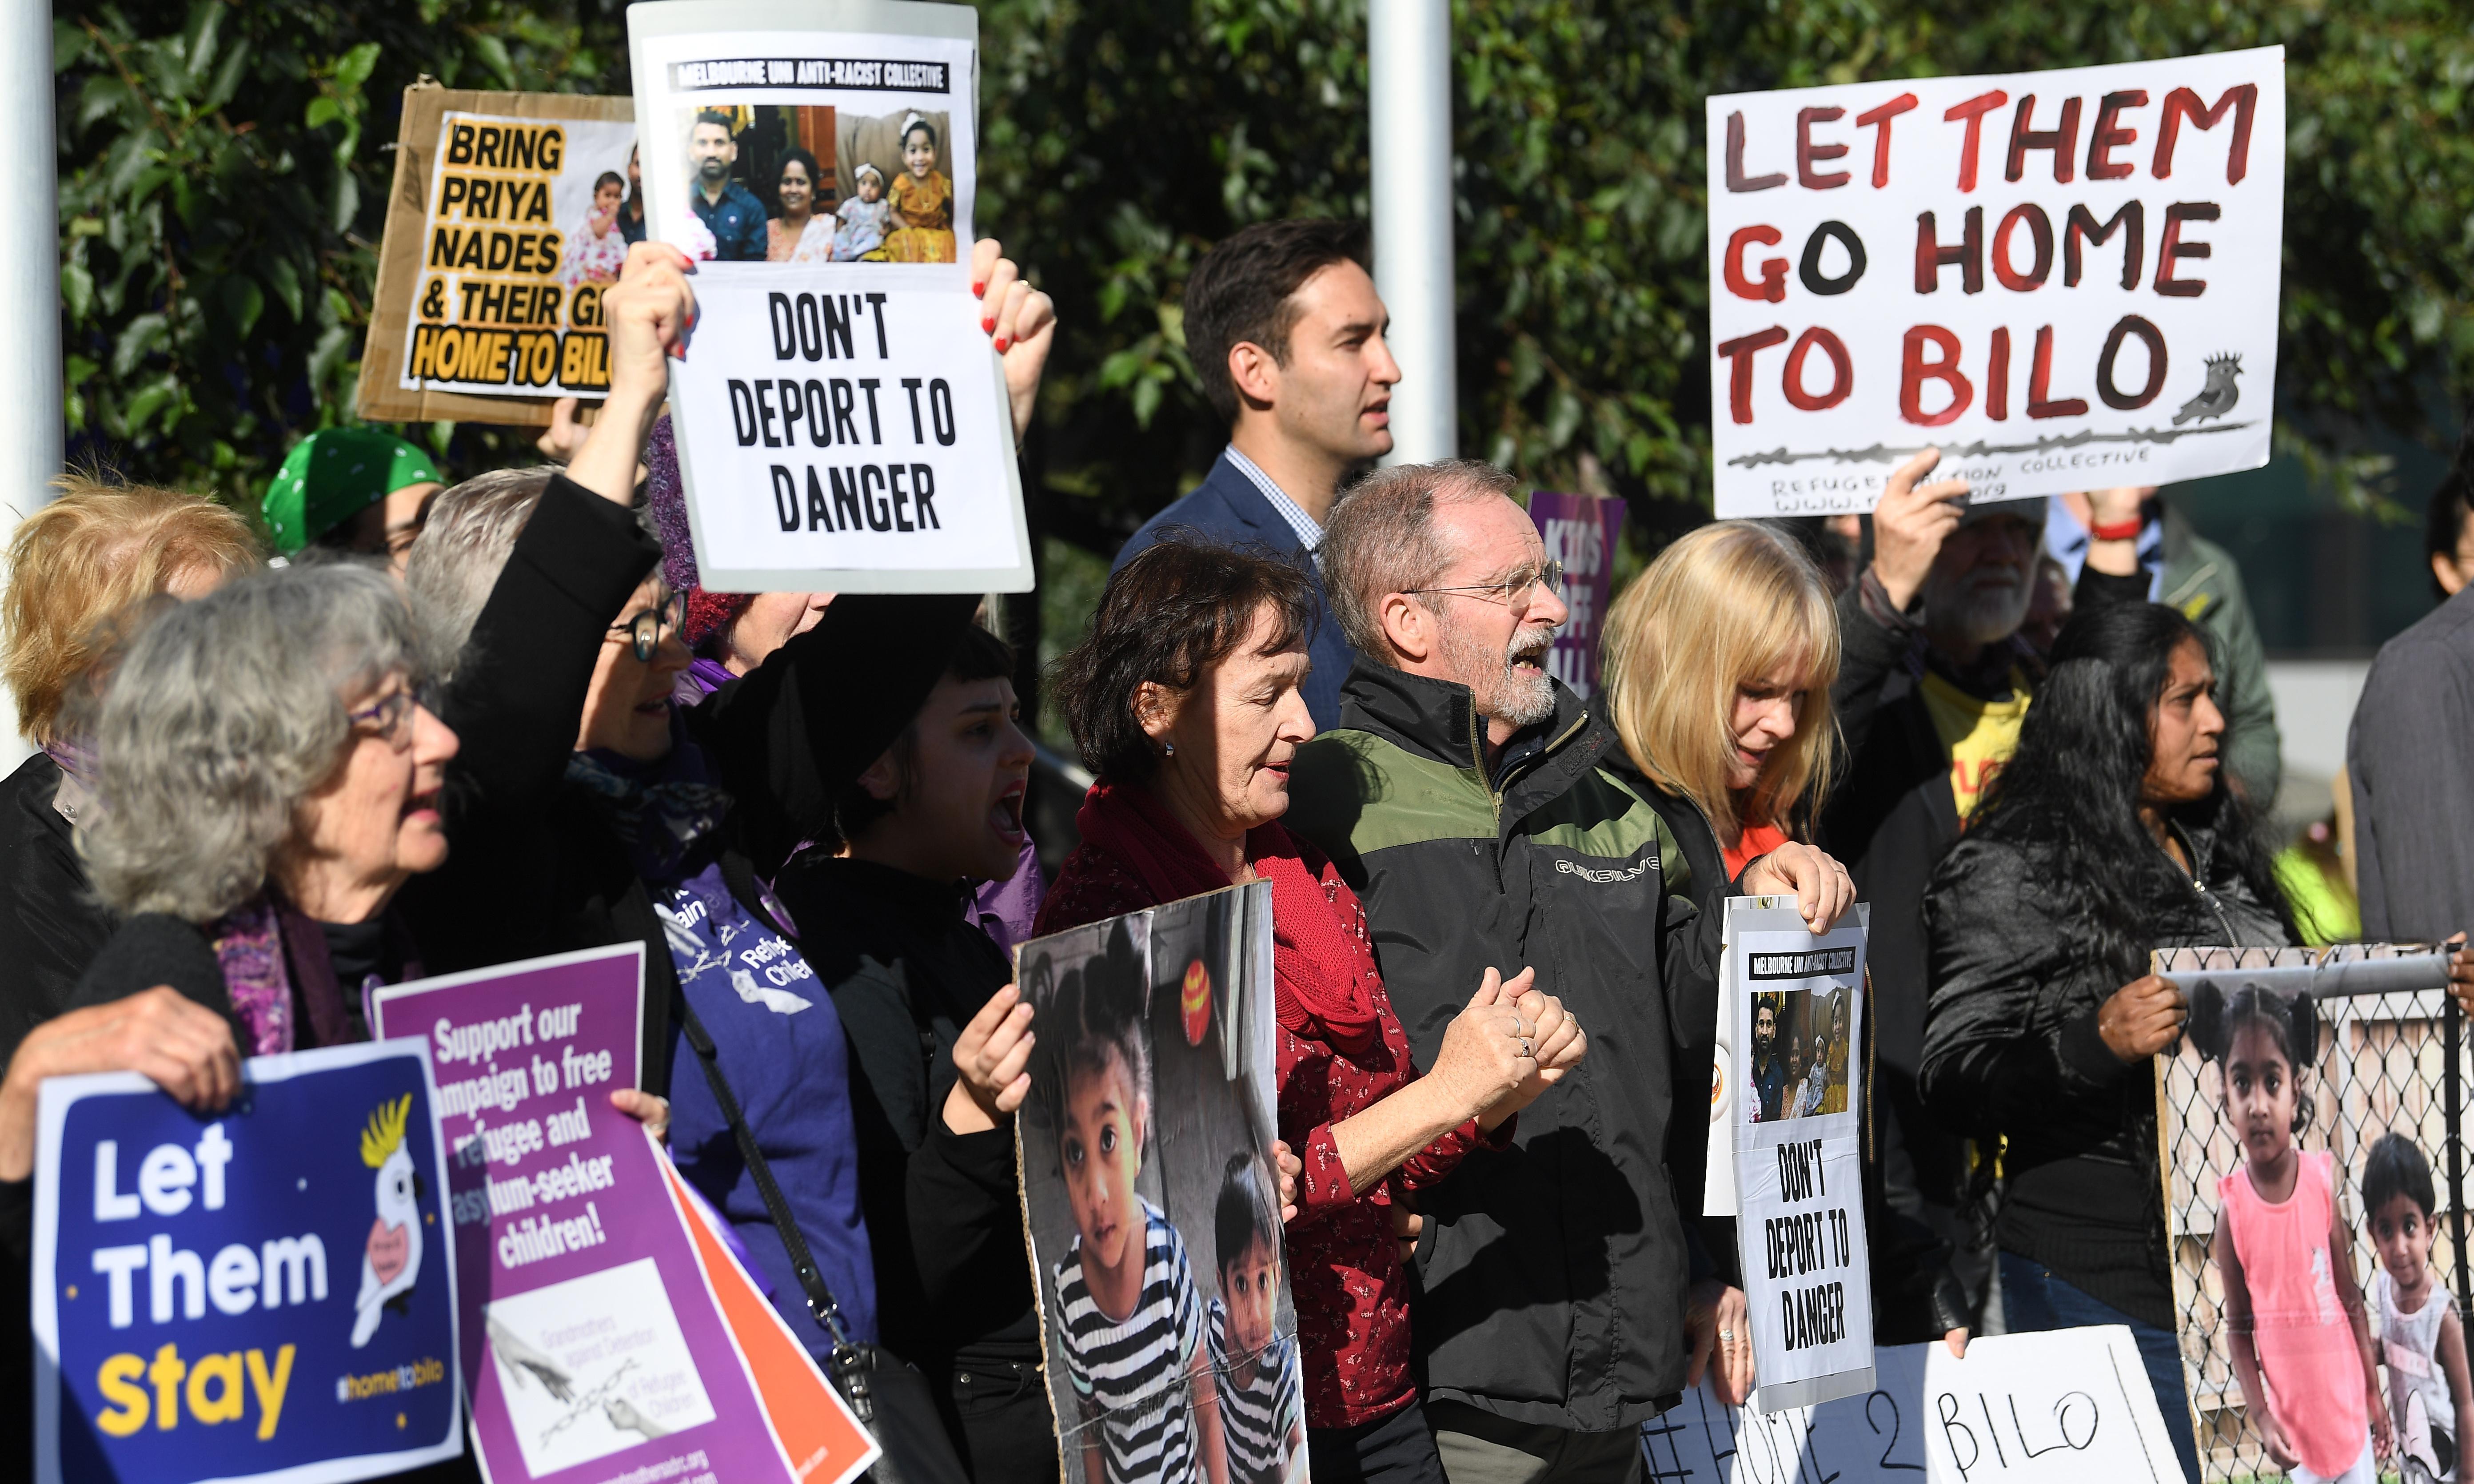 The hypocrisy, double standards and micro-cruelties at heart of Biloela case